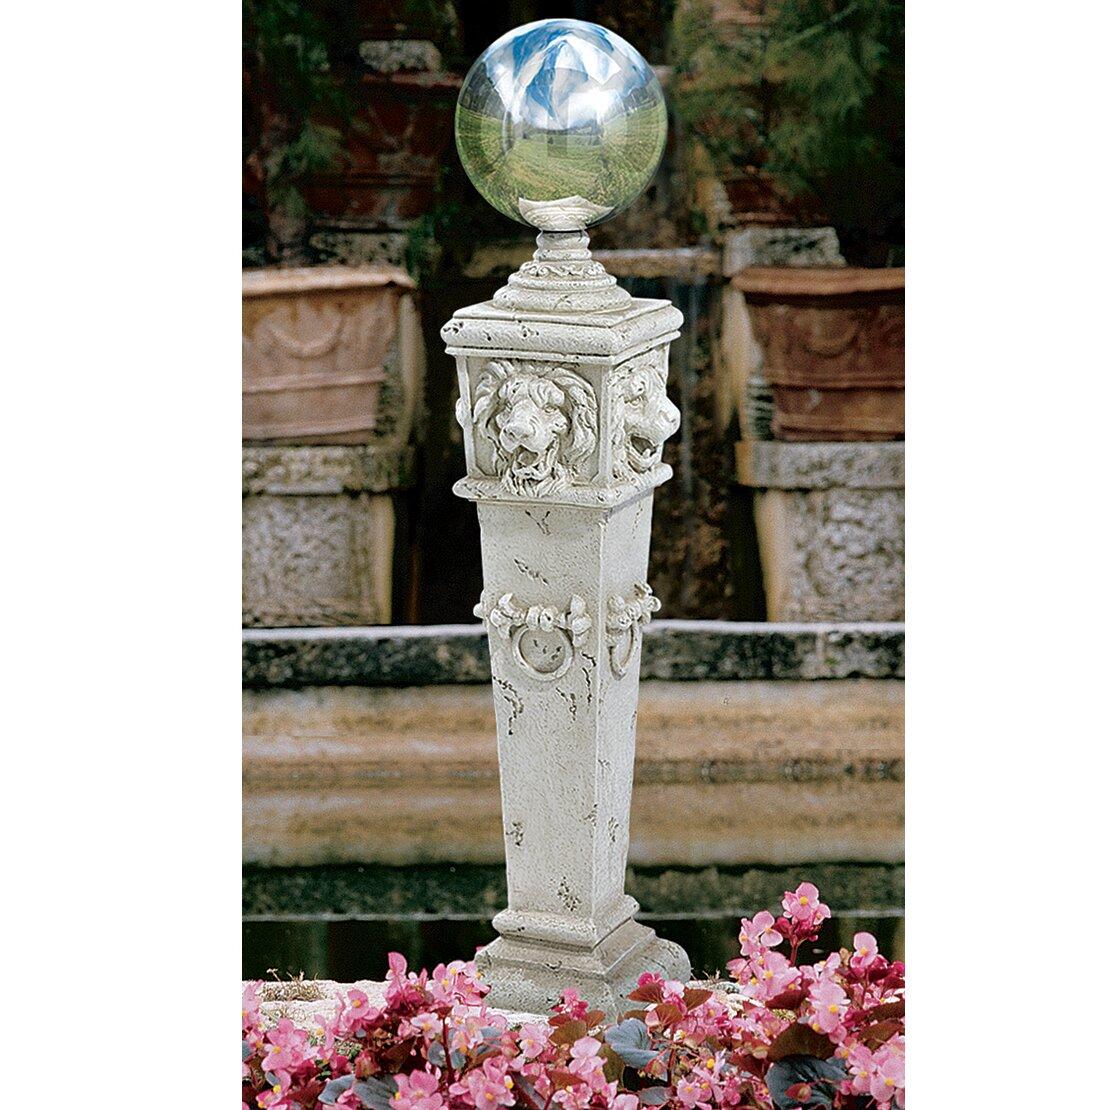 design toscano lion head gazing globe pillar garden statue reviews wayfair. Black Bedroom Furniture Sets. Home Design Ideas